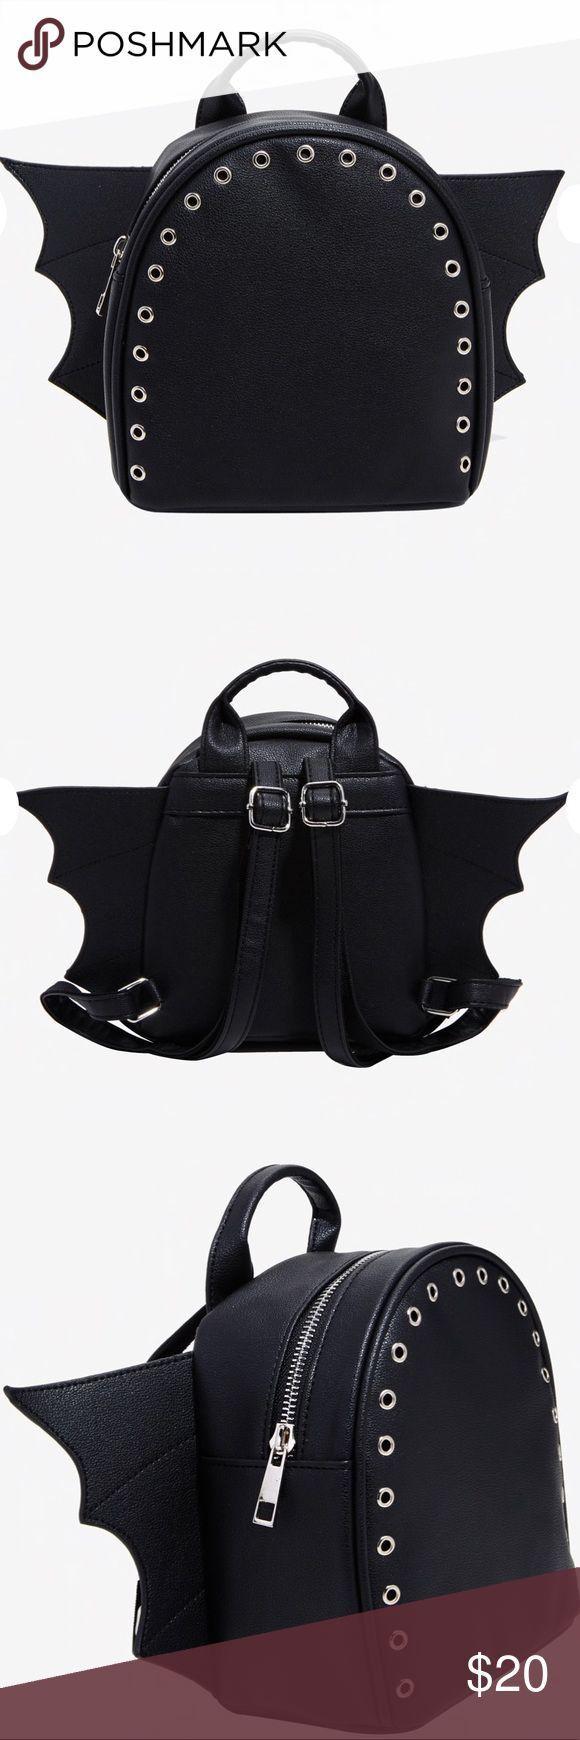 #Bags #Fledermaus #Hot #mini #Neu #RUCKSACK #Rucksäcke #topic #Womens Backpack hot topic NEW! Mini Bat Backpack NEW! Hot Topic Bags Backpacks        NEU! Mini Fledermaus Rucksack NEU! Hot Topic Bags Rucksäcke #hottopicclothes #Bags #Fledermaus #Hot #mini #Neu #RUCKSACK #Rucksäcke #topic #Womens Backpack hot topic NEW! Mini Bat Backpack NEW! Hot Topic Bags Backpacks        NEU! Mini Fledermaus Rucksack NEU! Hot Topic Bags Rucksäcke #hottopicclothes